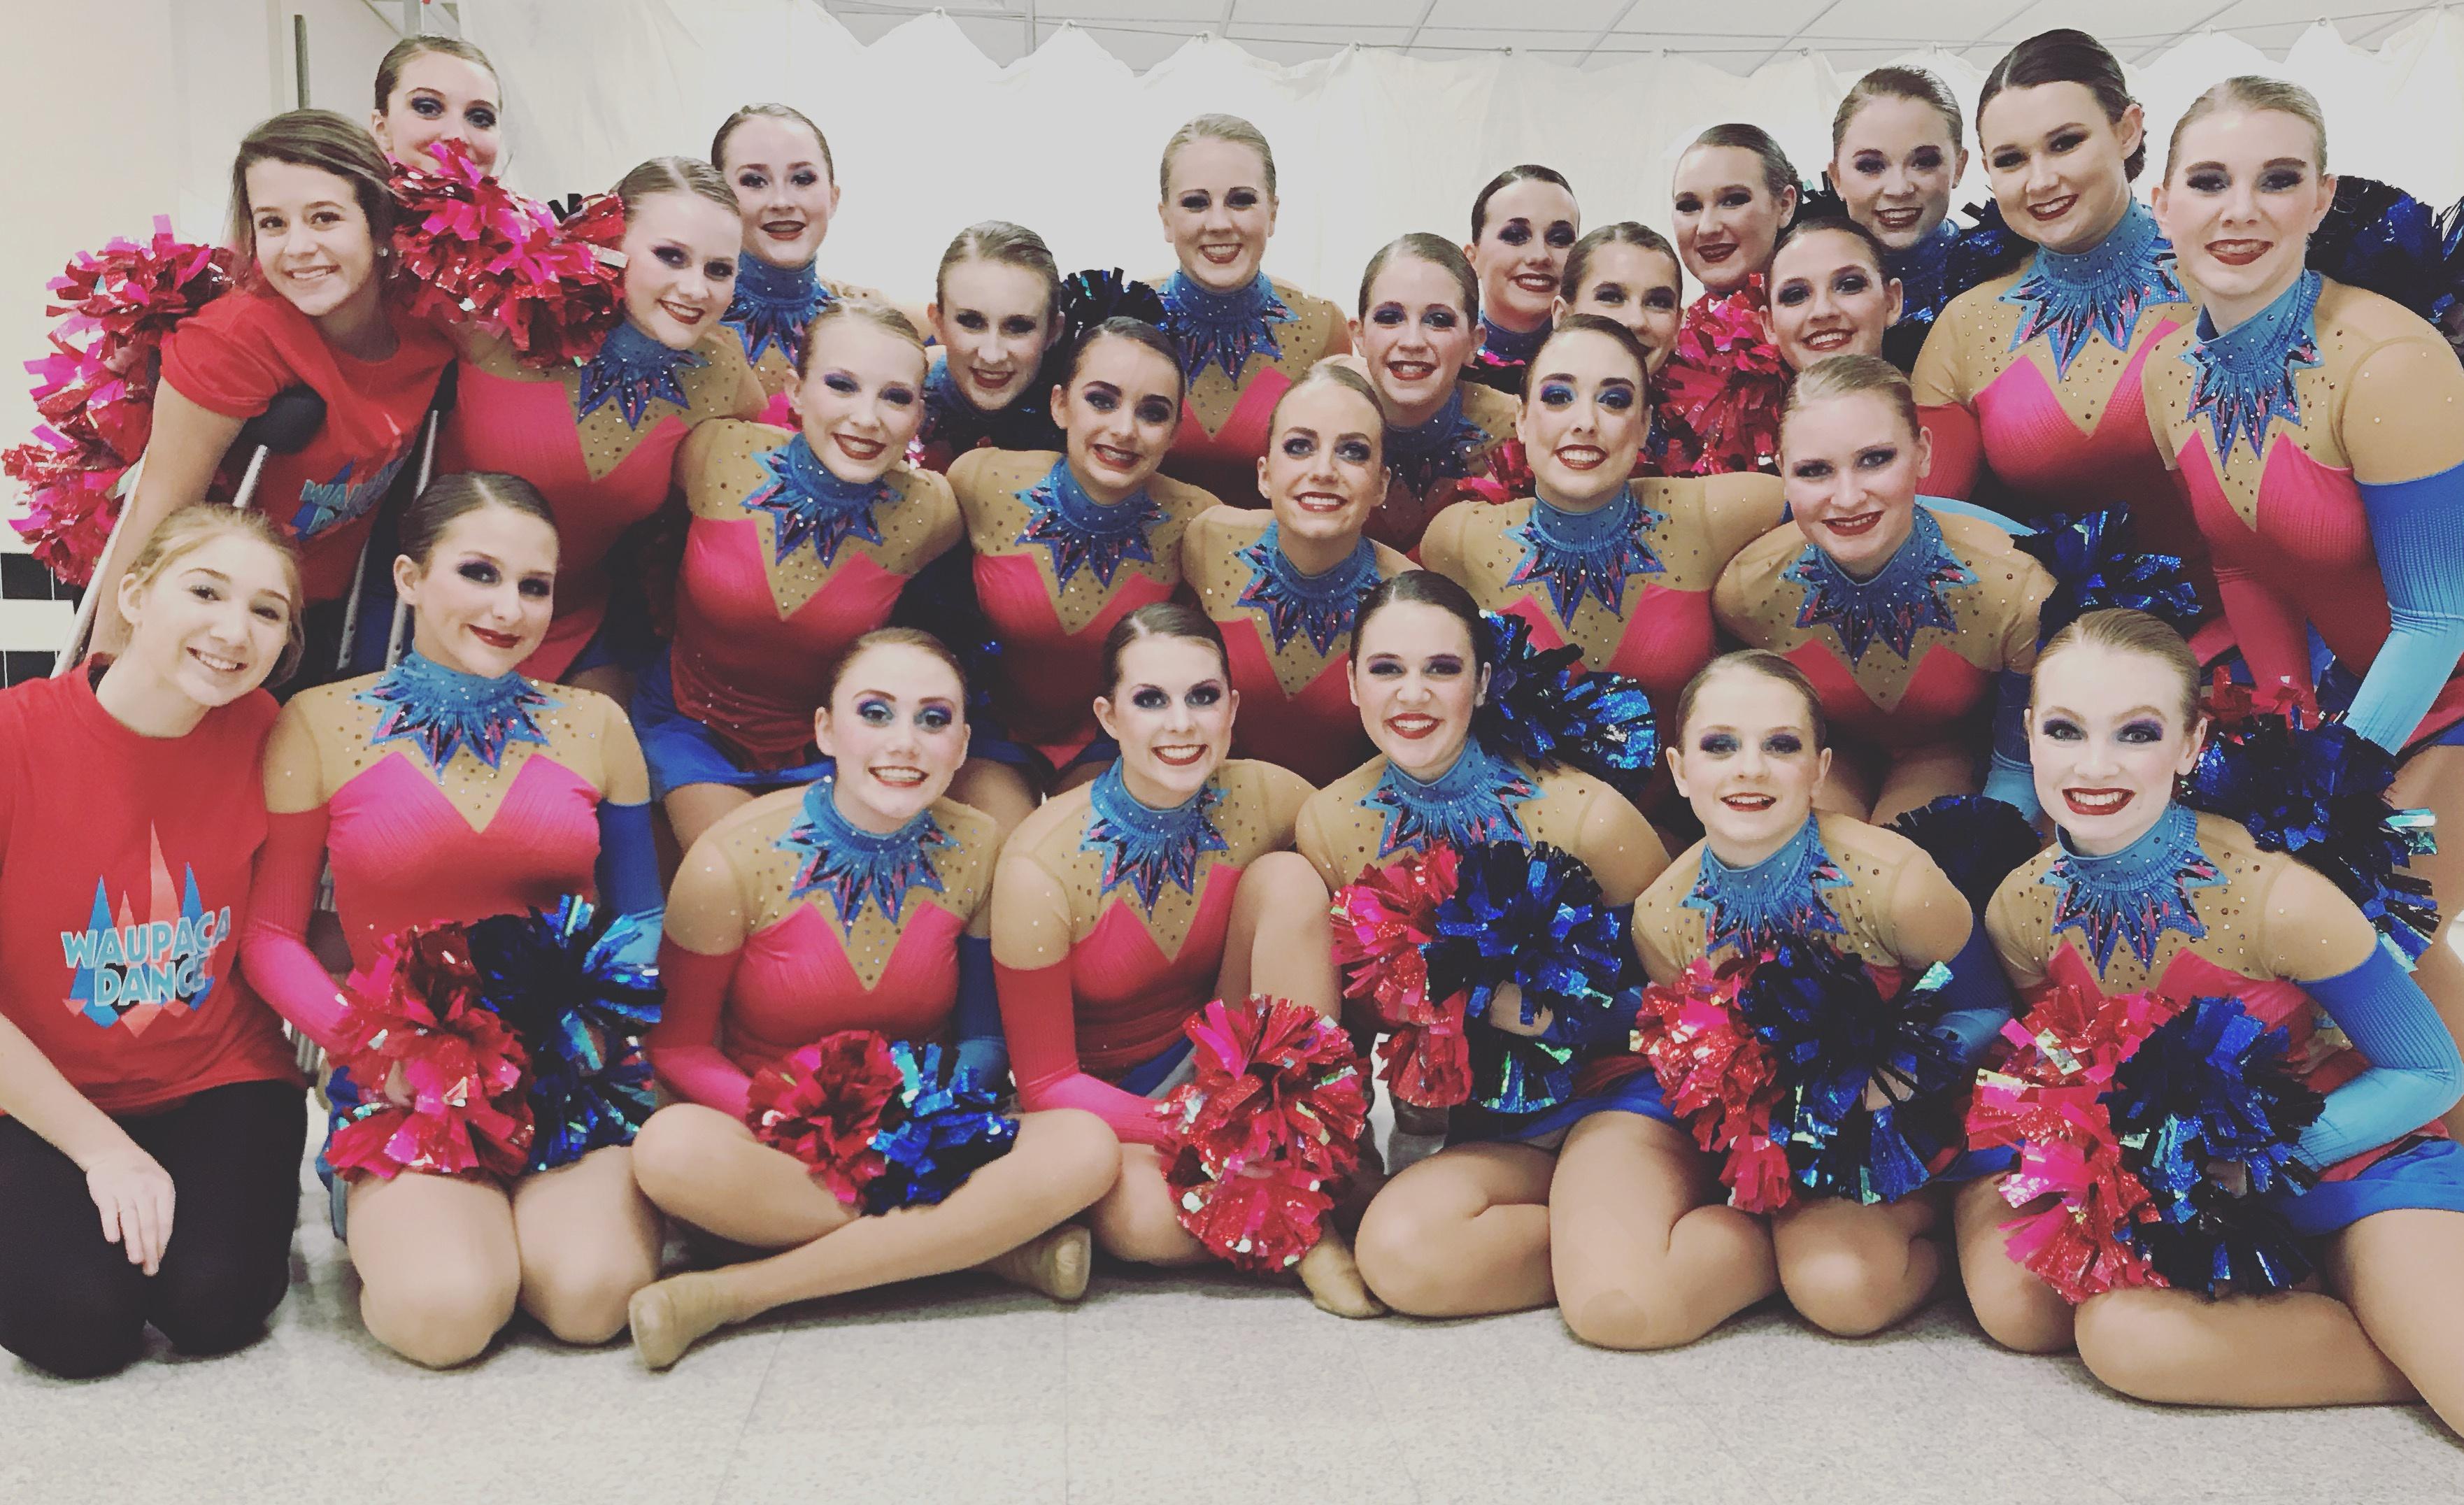 Waupaca dance team custom pom uniform